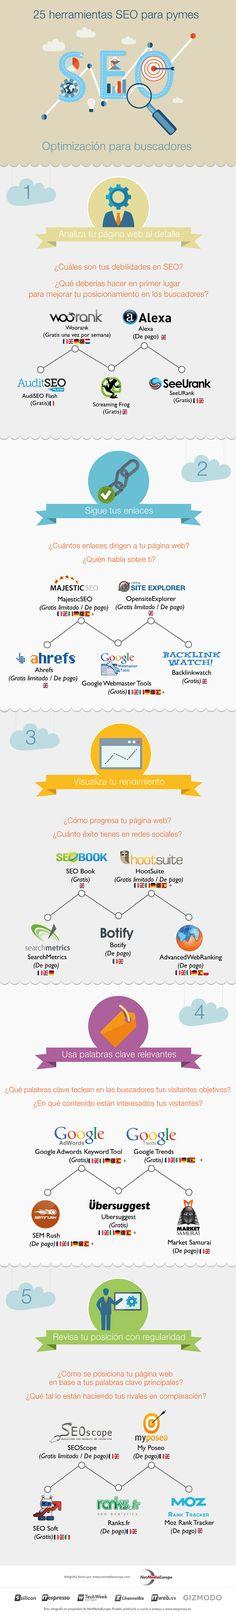 25 herramientas SEO para pymes [Infografía] - Silicon News